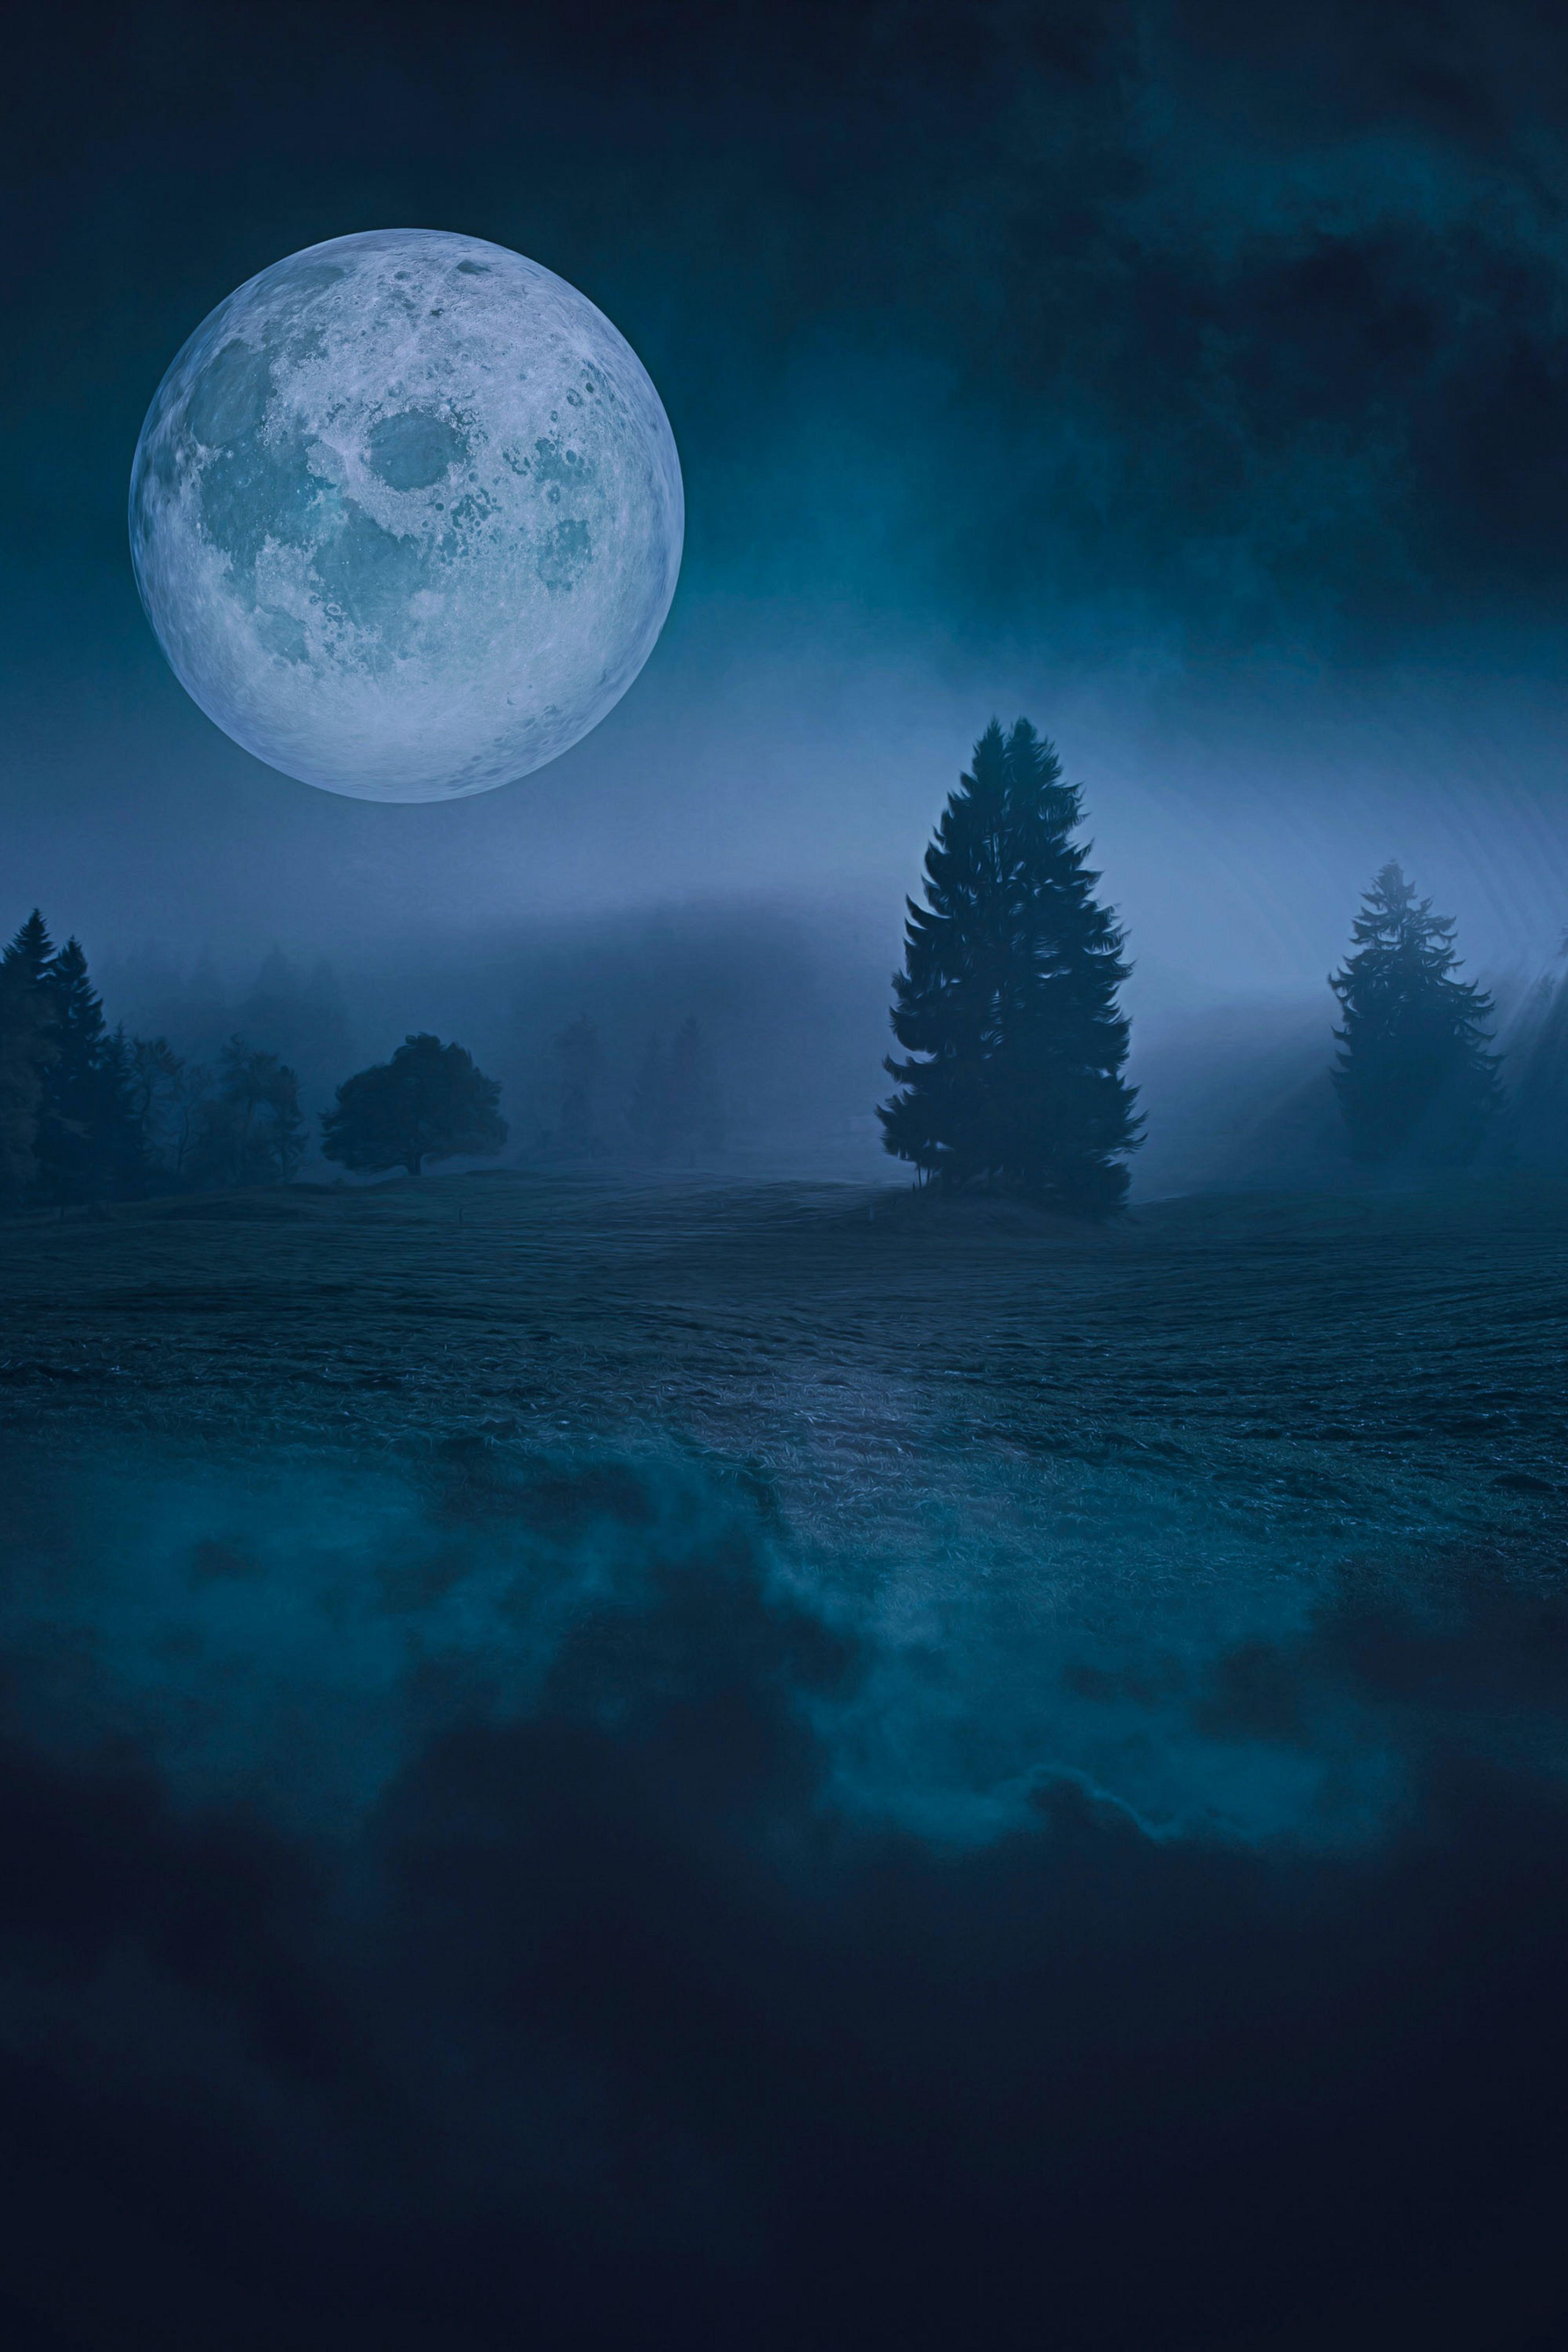 Beautiful Image By Darksouls1 Beautiful Images Beautiful Wallpaper Hd wallpaper trees silhouette night moon